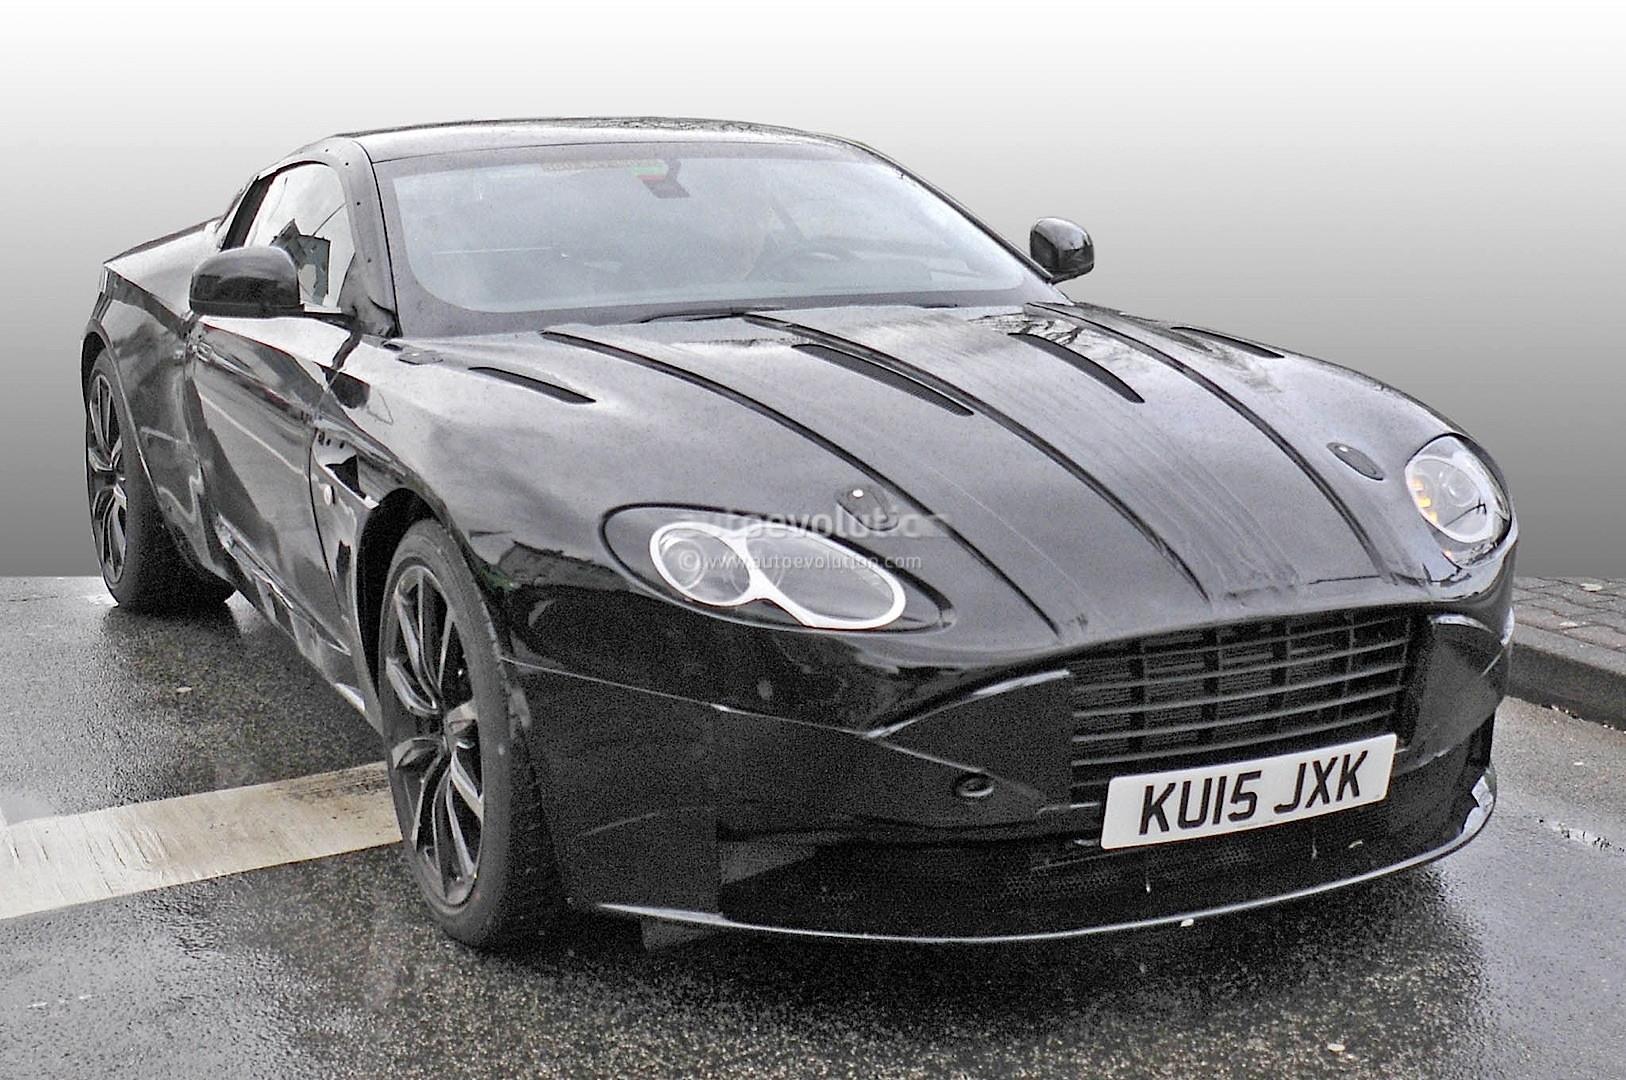 2016 - [Aston Martin] DB11 2017-aston-martin-db9-successor-prototype-spyshots-show-db10-like-silhouette-digital-dashboard-intercoolers_12